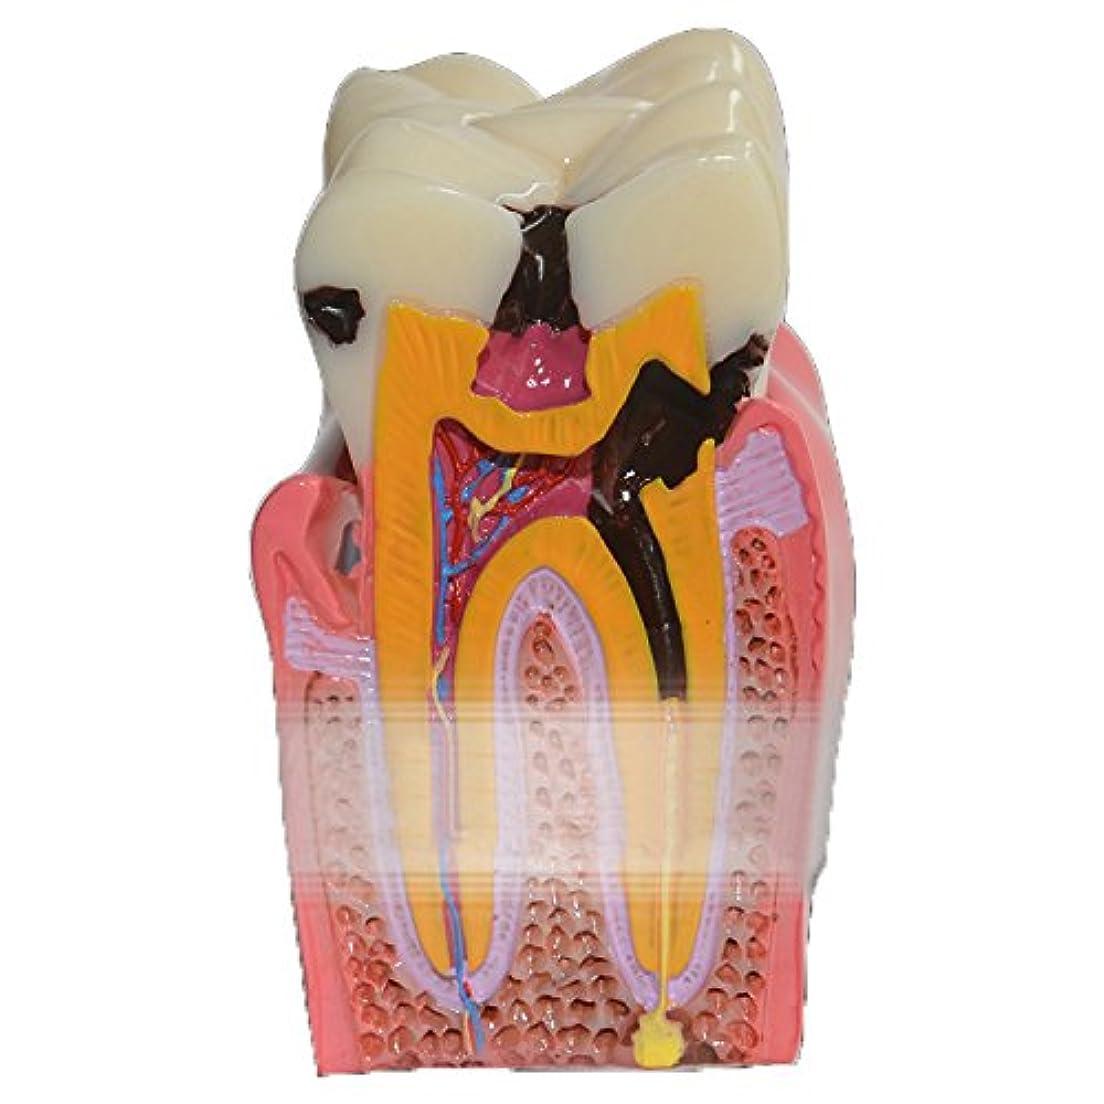 徴収船形取り替えるGoDen大人と小児歯模型 解剖学的歯模型 教学用模型